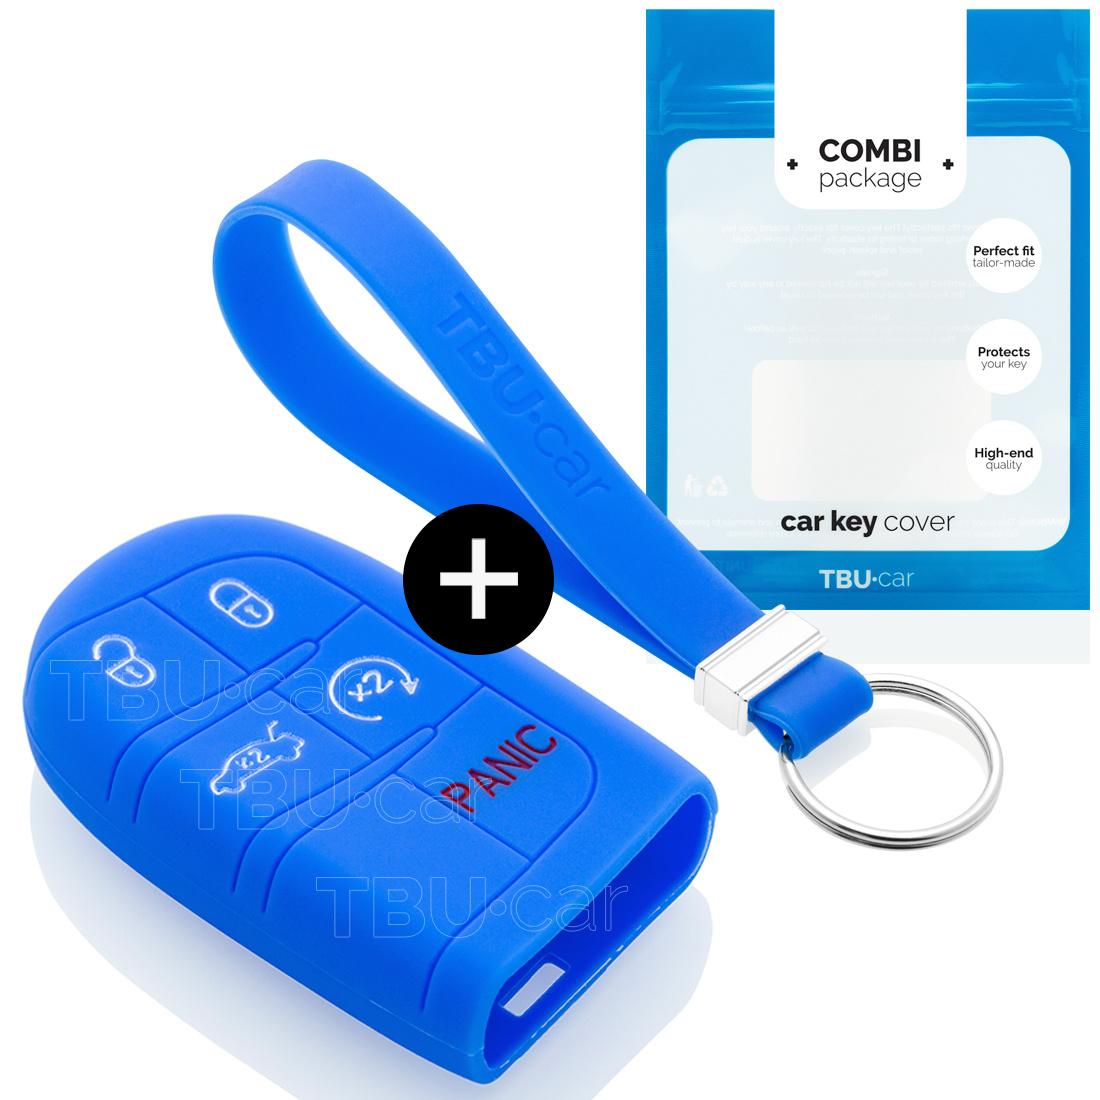 TBU car TBU car Sleutel cover compatibel met Fiat - Silicone sleutelhoesje - beschermhoesje autosleutel - Blauw